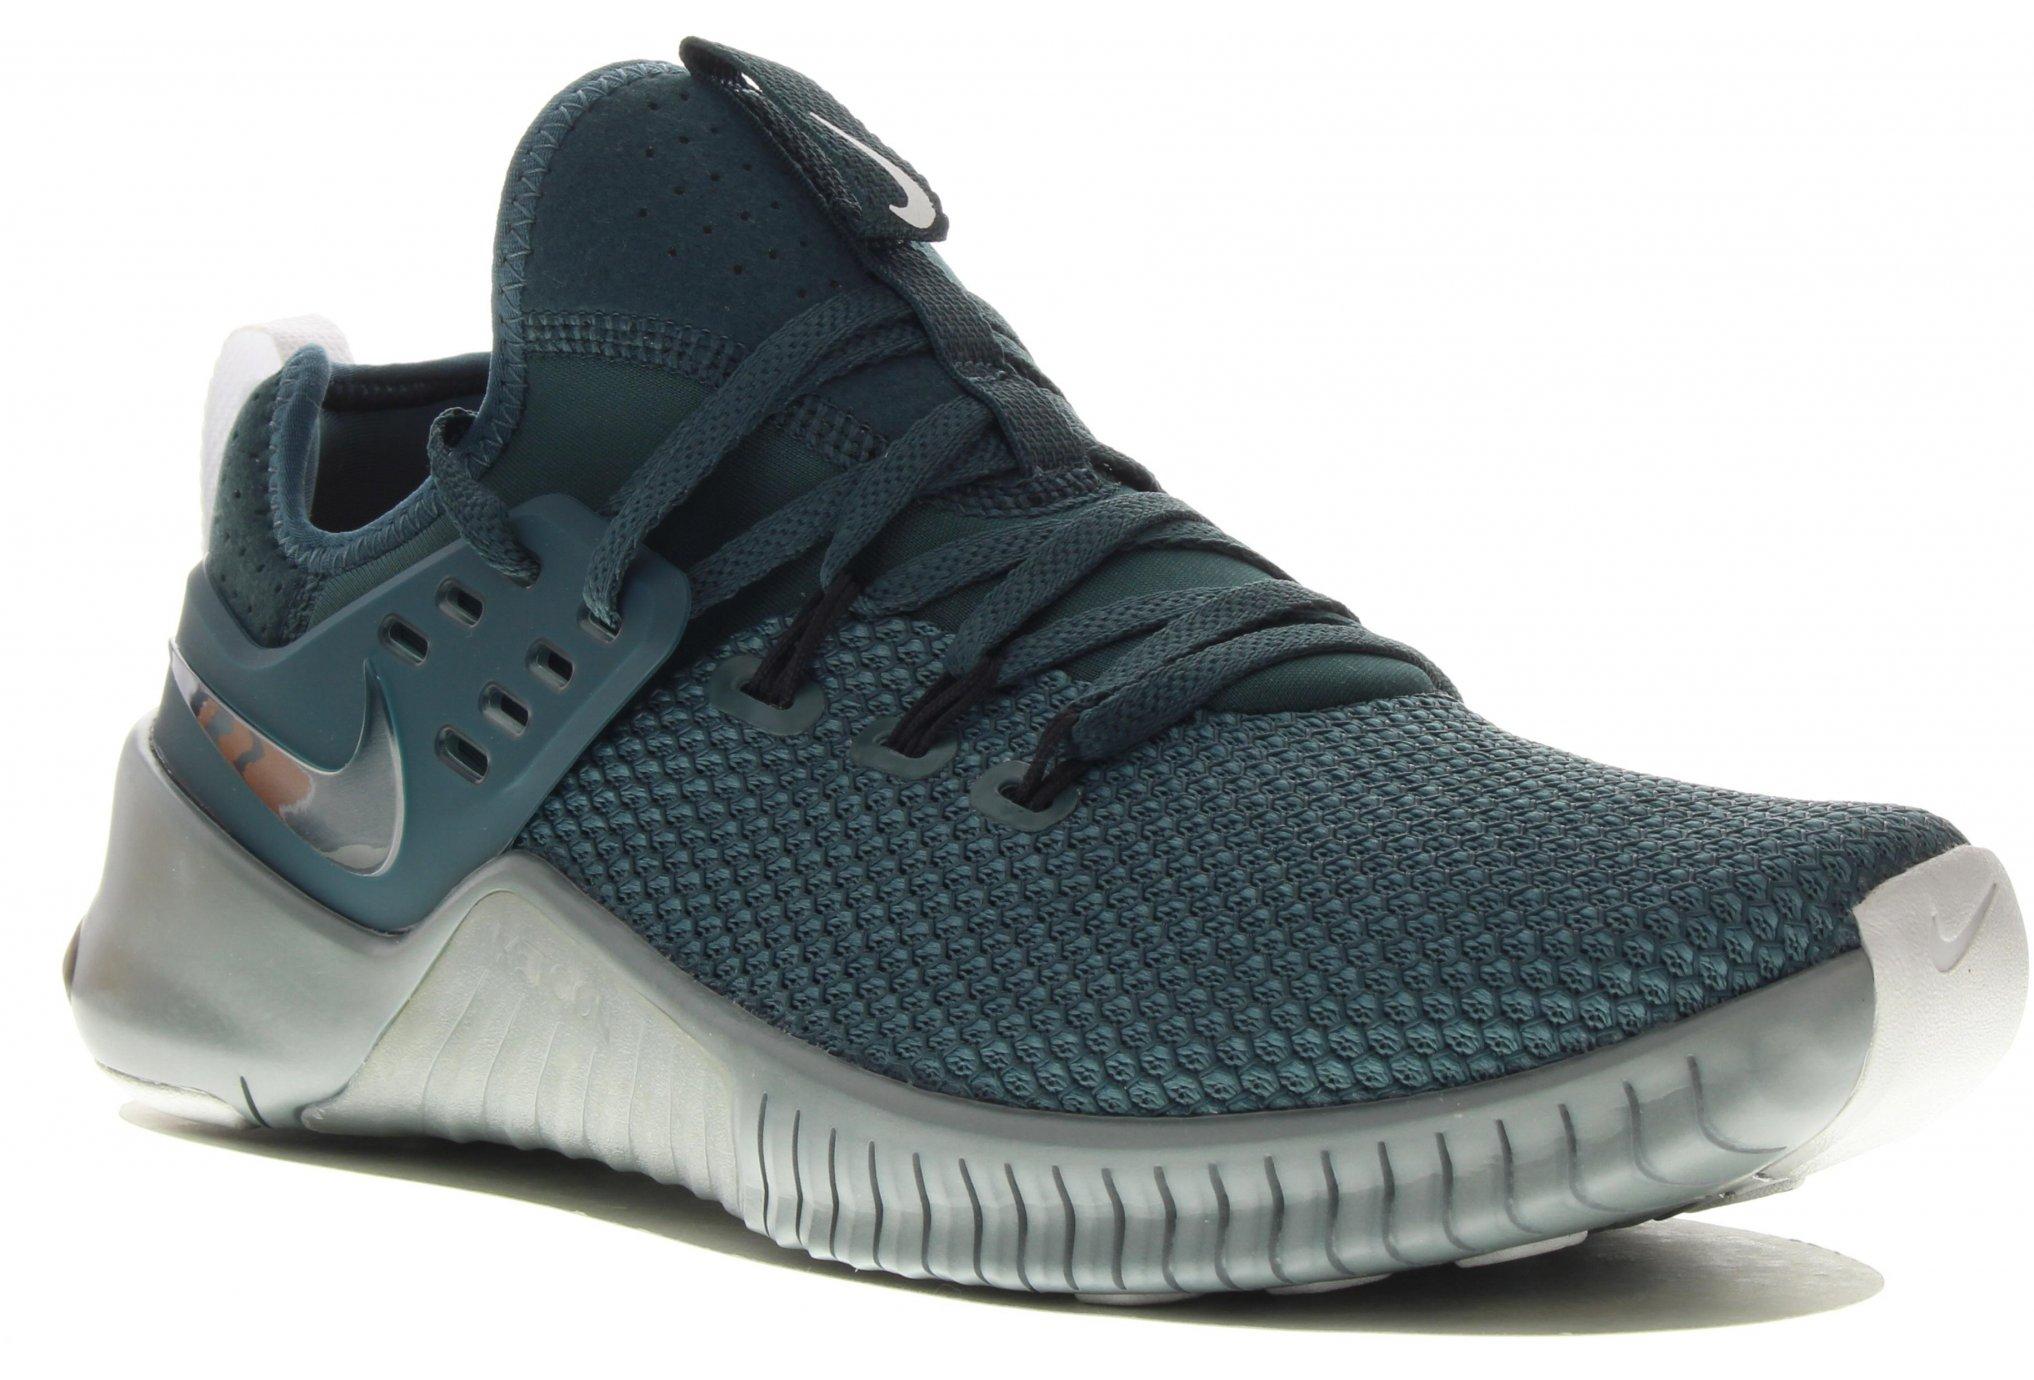 X Free Homme La Fortifiée Nike Chaussures Metcon M Wzqptph b6yIvgYf7m